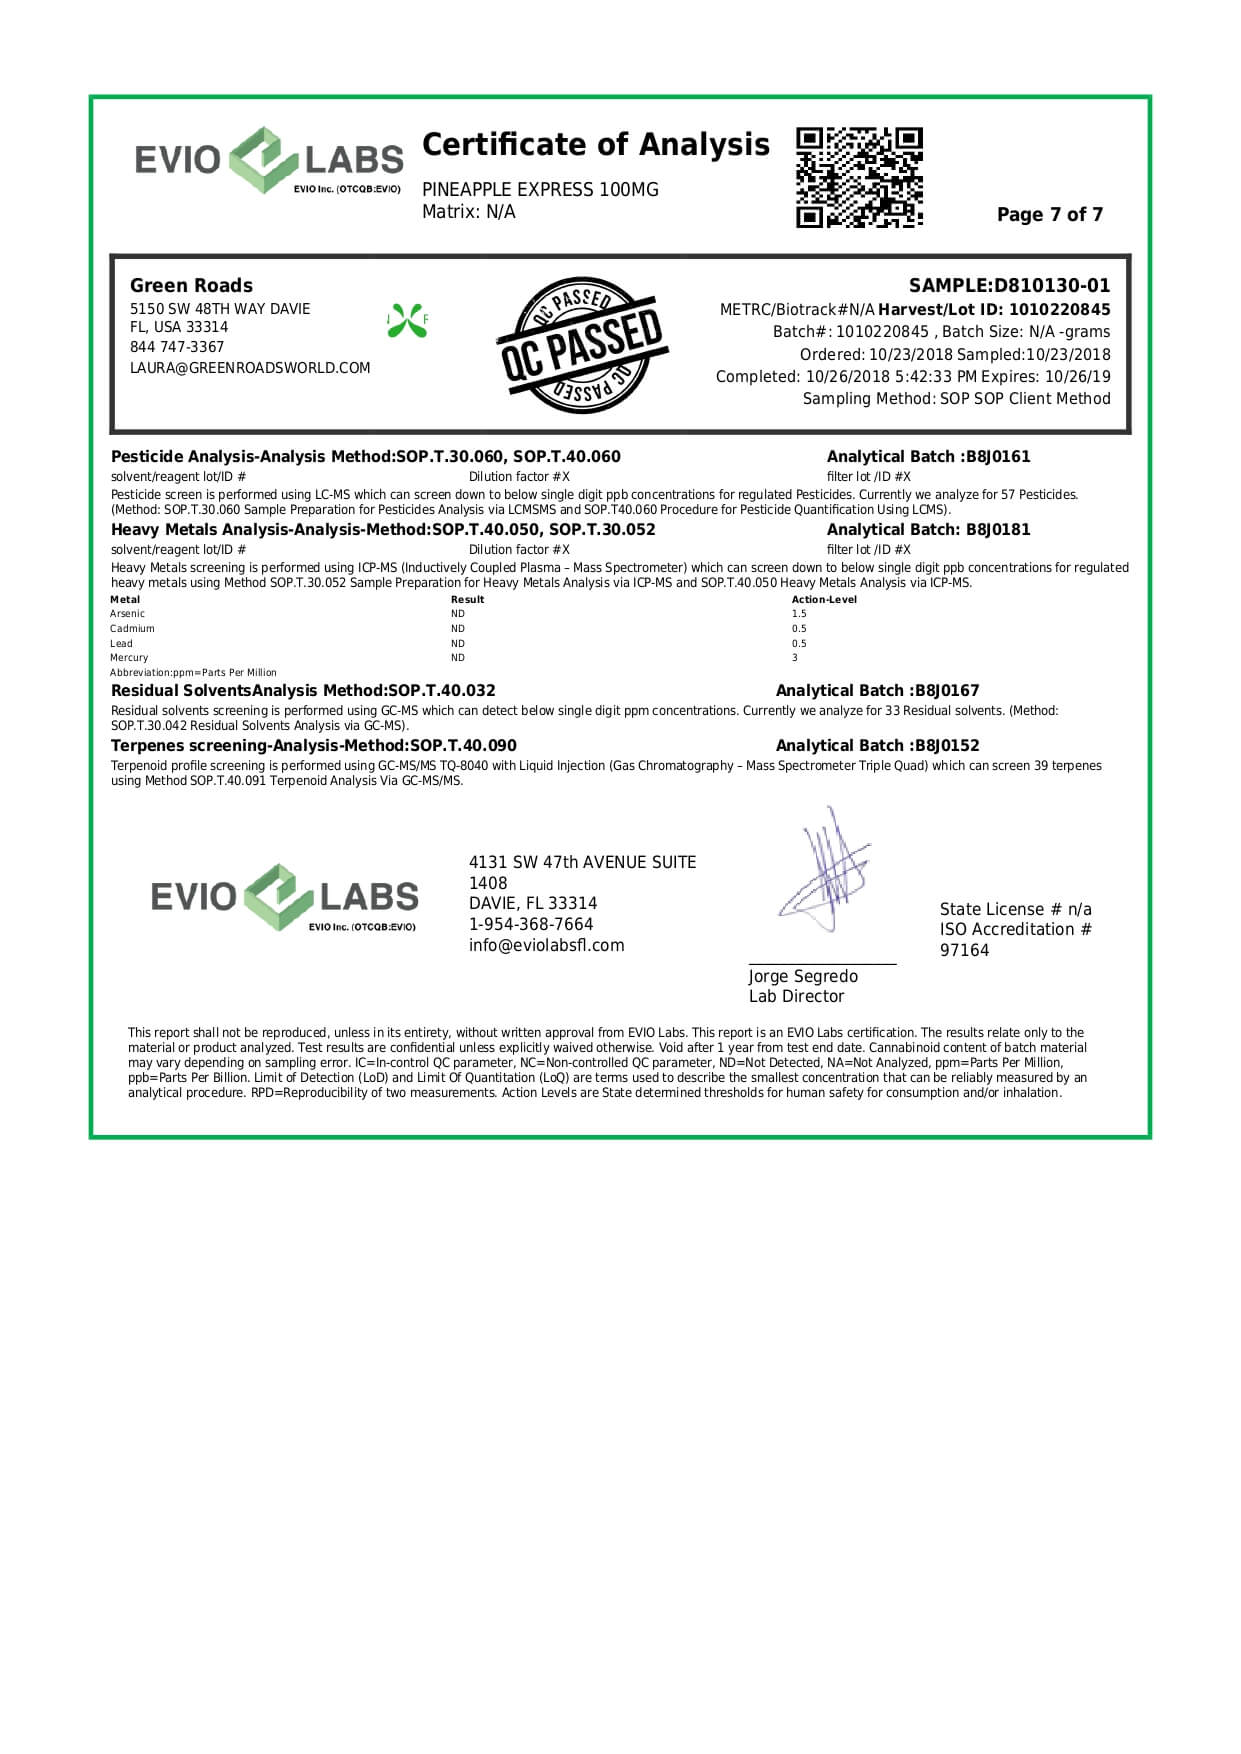 Green Roads CBD Terpenes Oil Pineapple Express 100mg Lab Report